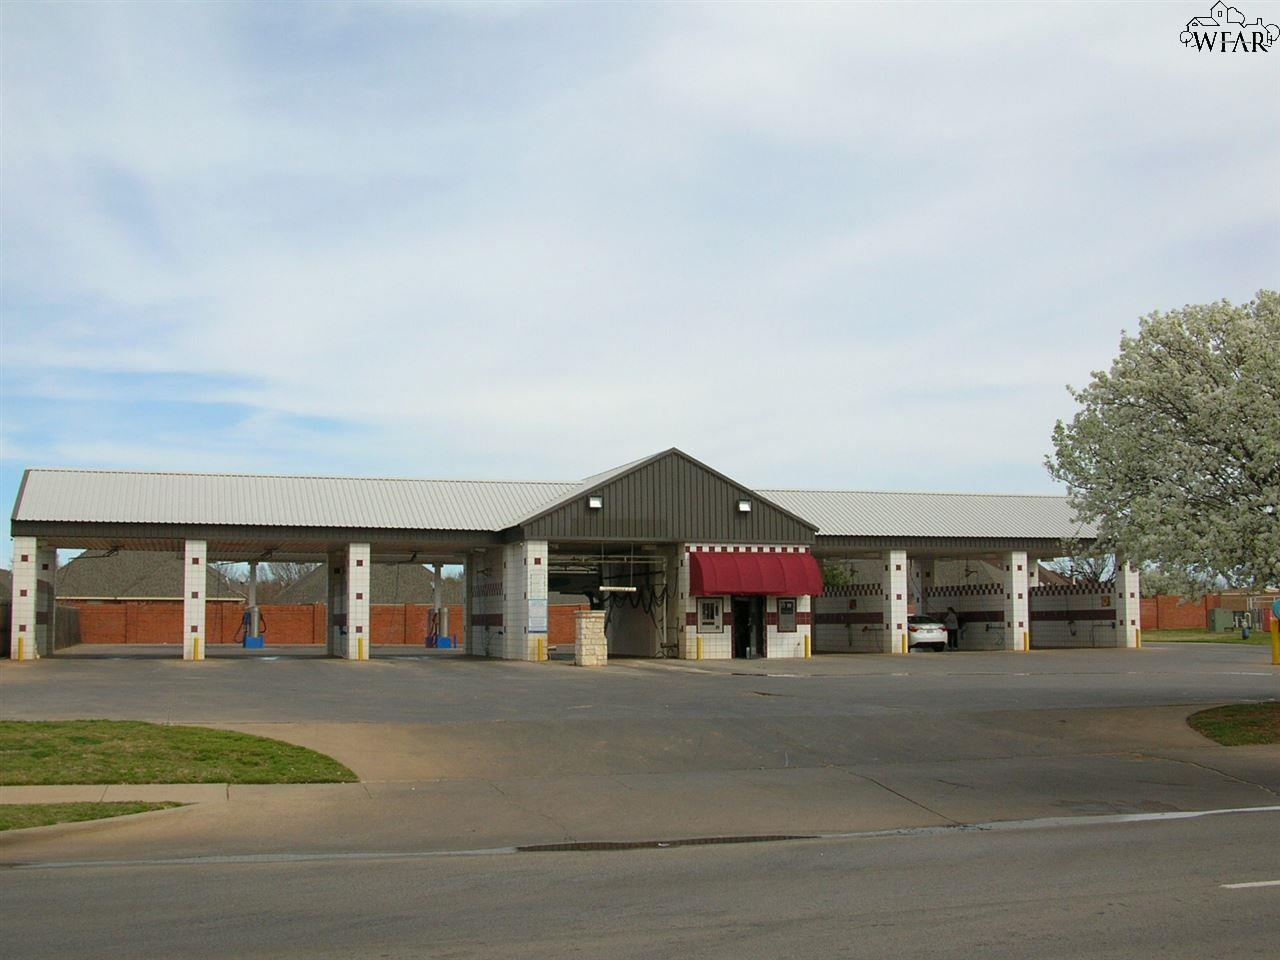 4533 MAPLEWOOD AVENUE, Wichita Falls, TX 76308